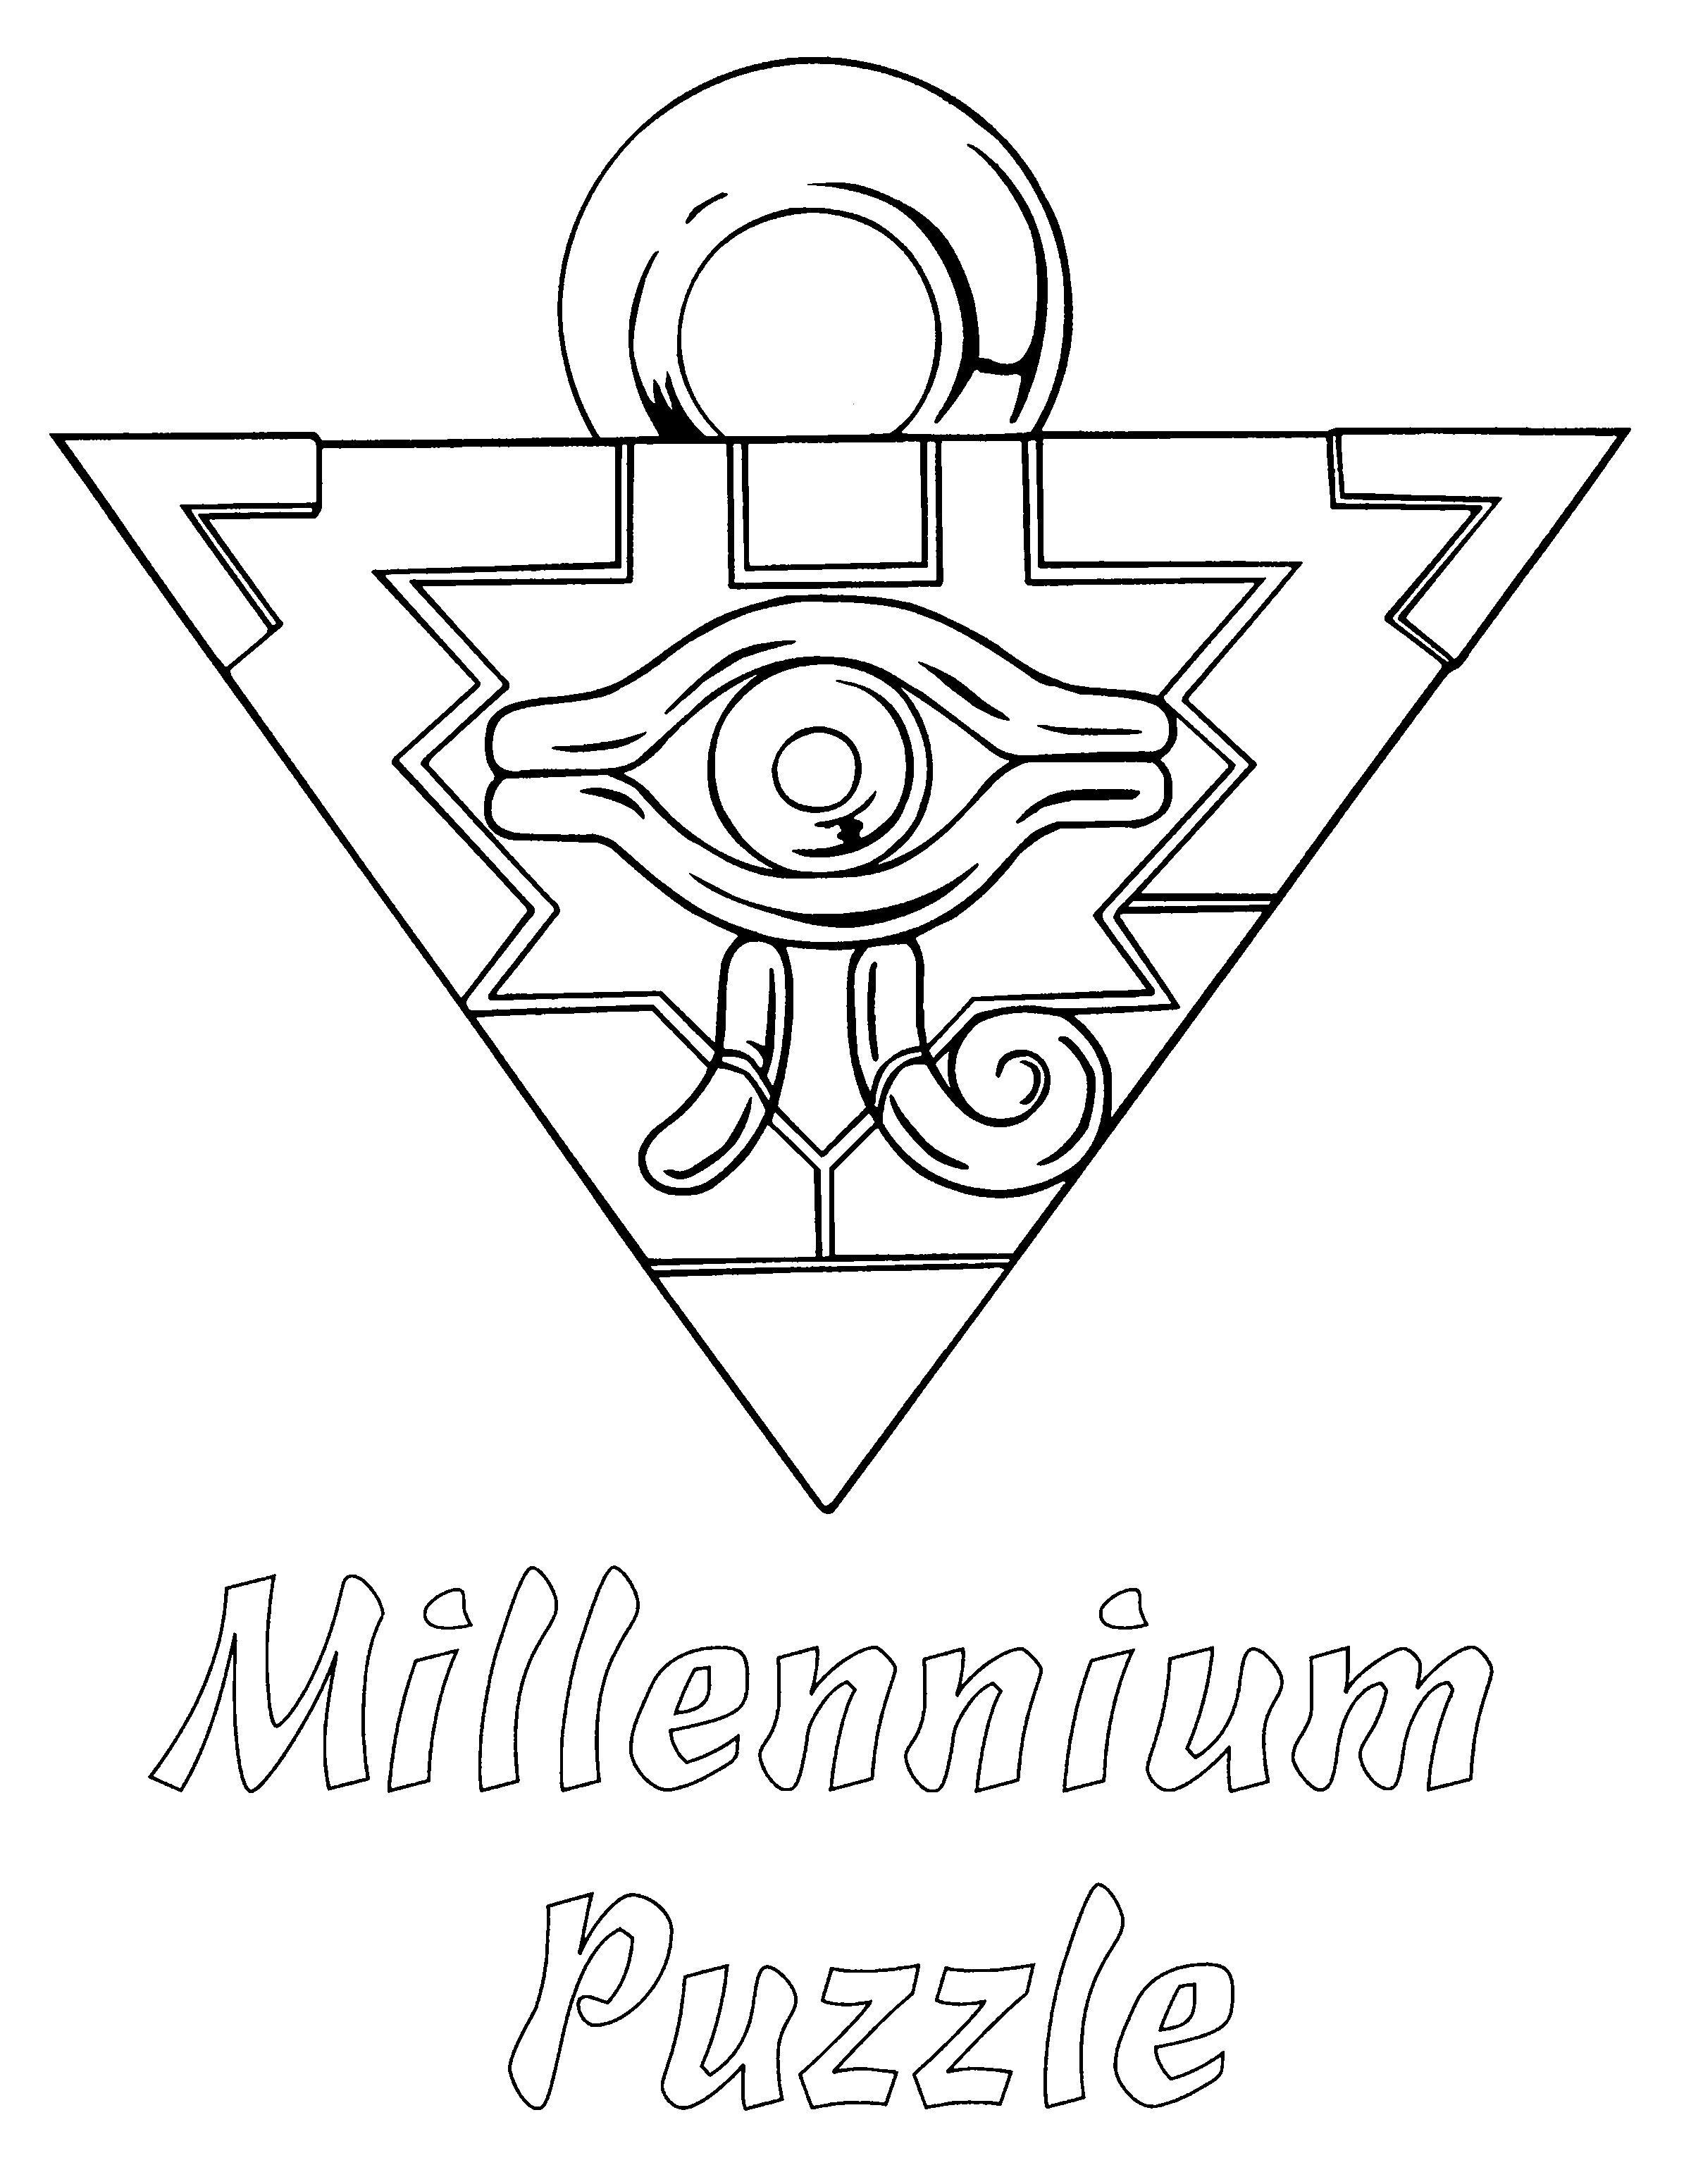 Einzigartig Malvorlagen Yu Gi Oh Tatuagens De Anime Tatuagem Tatuagens